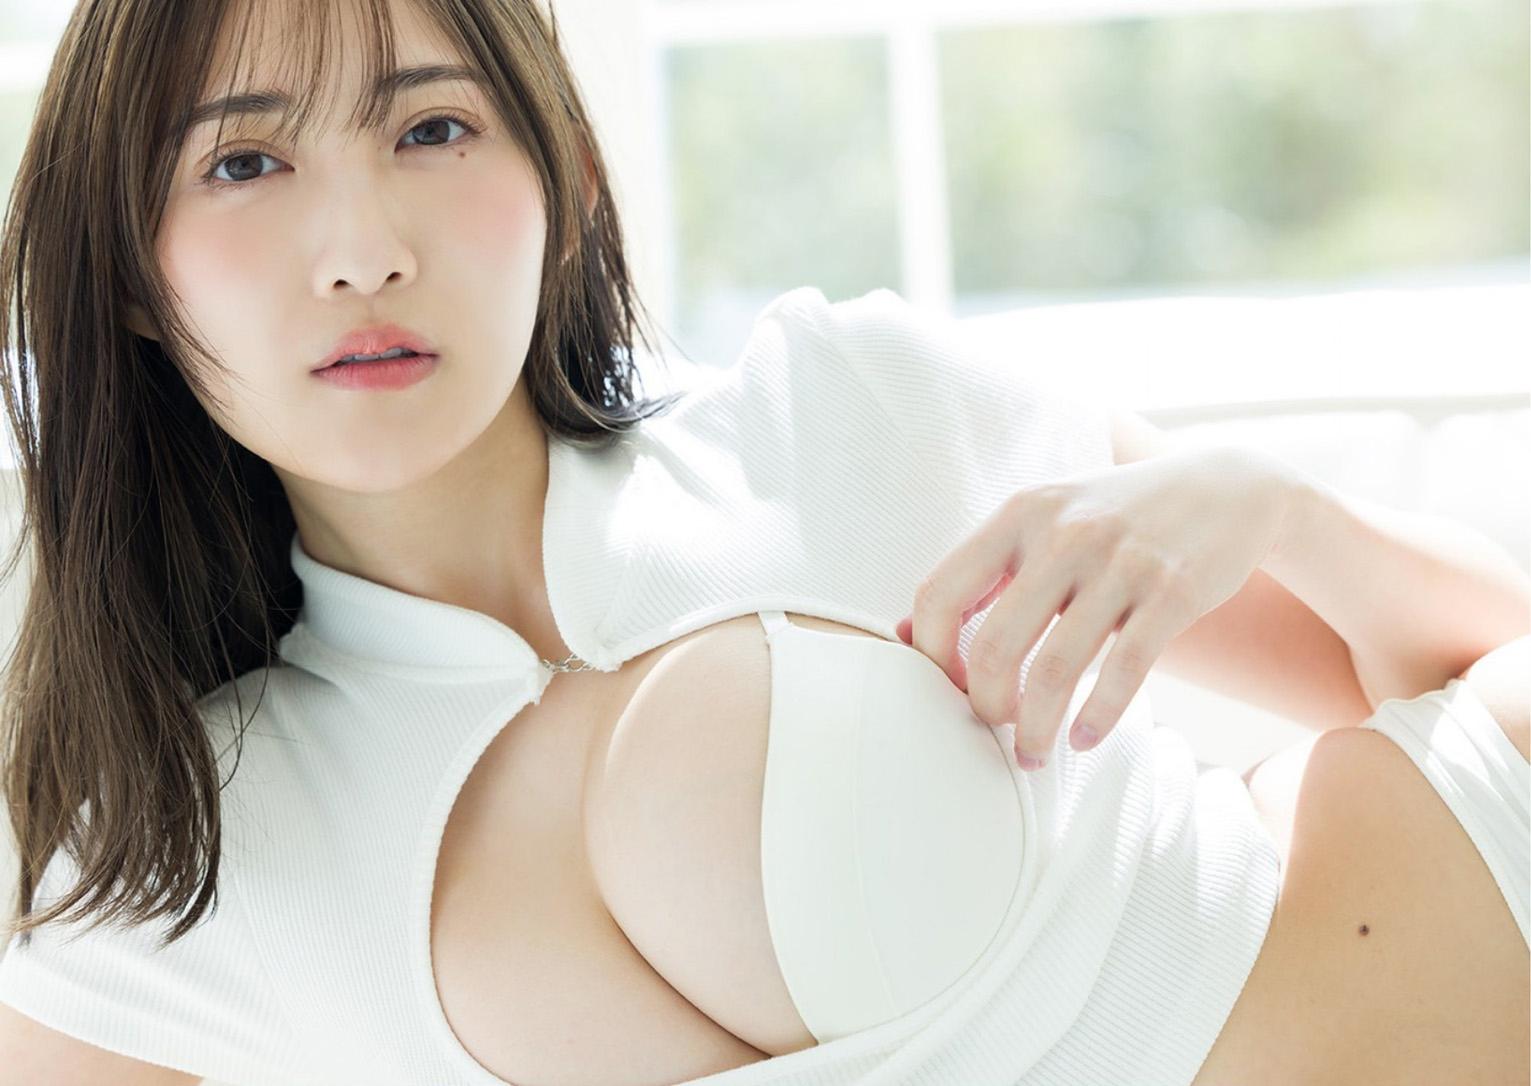 eyval.net : つじ りりさ, 辻りりさ, Ririsa Tsuji - Young Jump, 2021.06.03